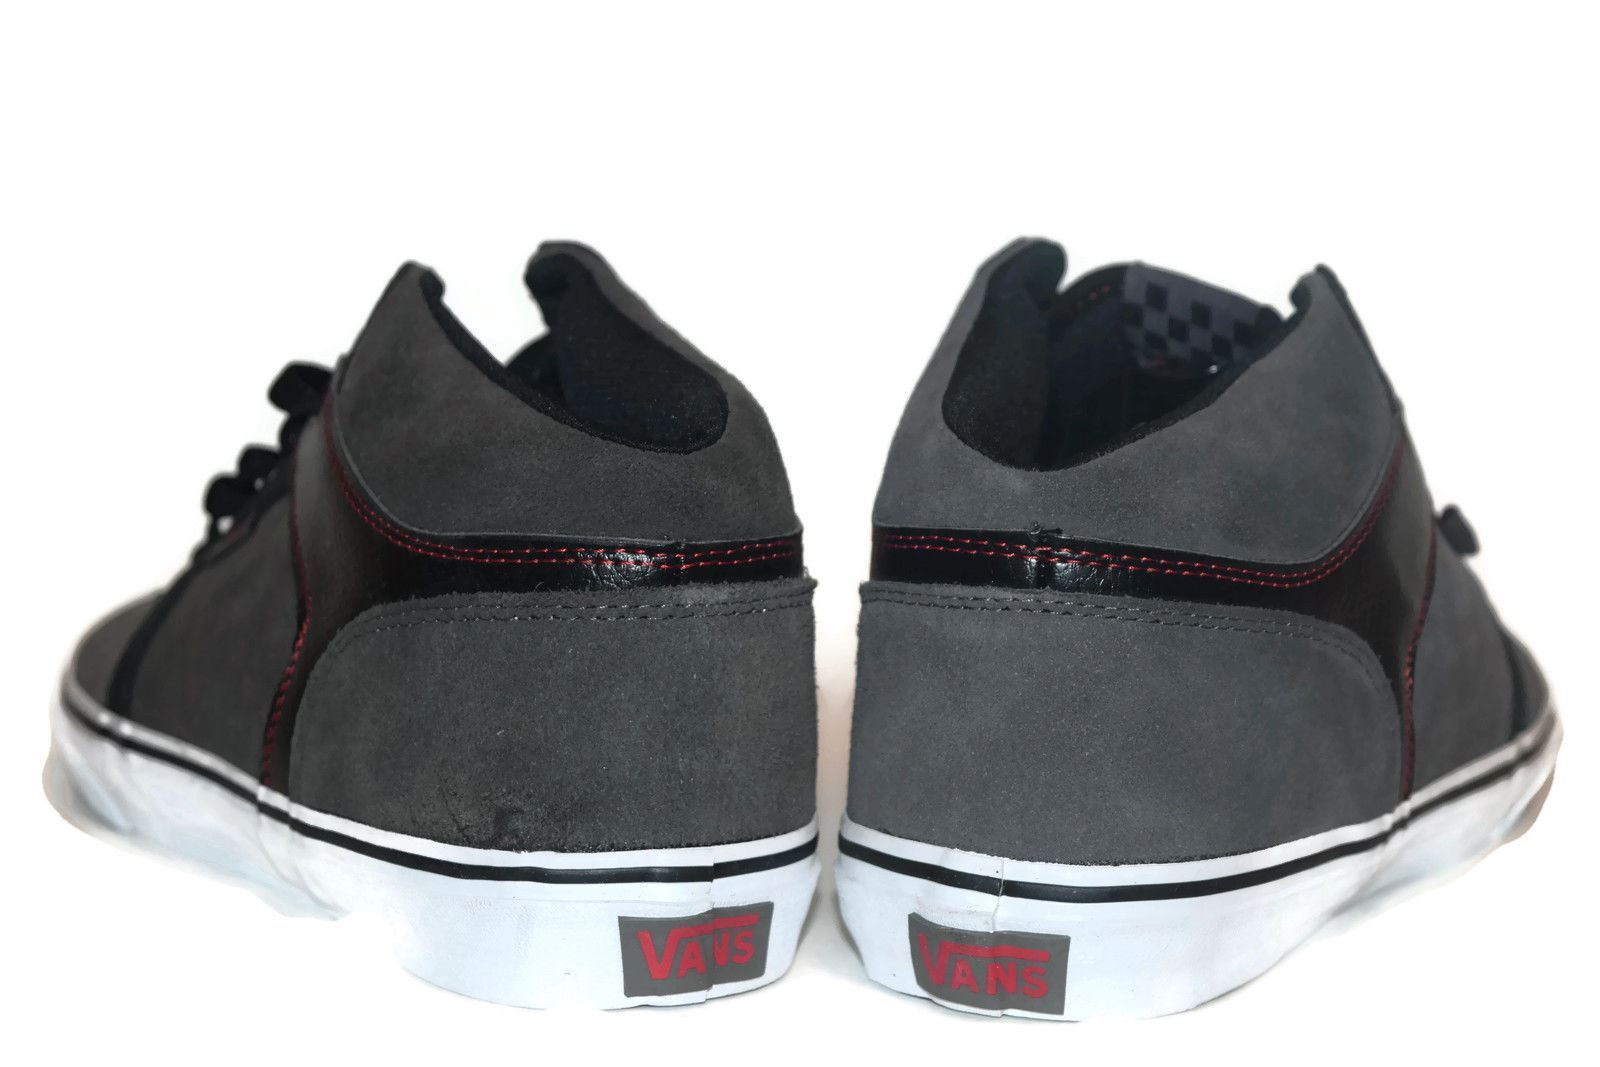 VANS Ellis Mid (Red Stitch) Charcoal/Black Casual Skate MEN'S 6.5 WOMEN'S 8